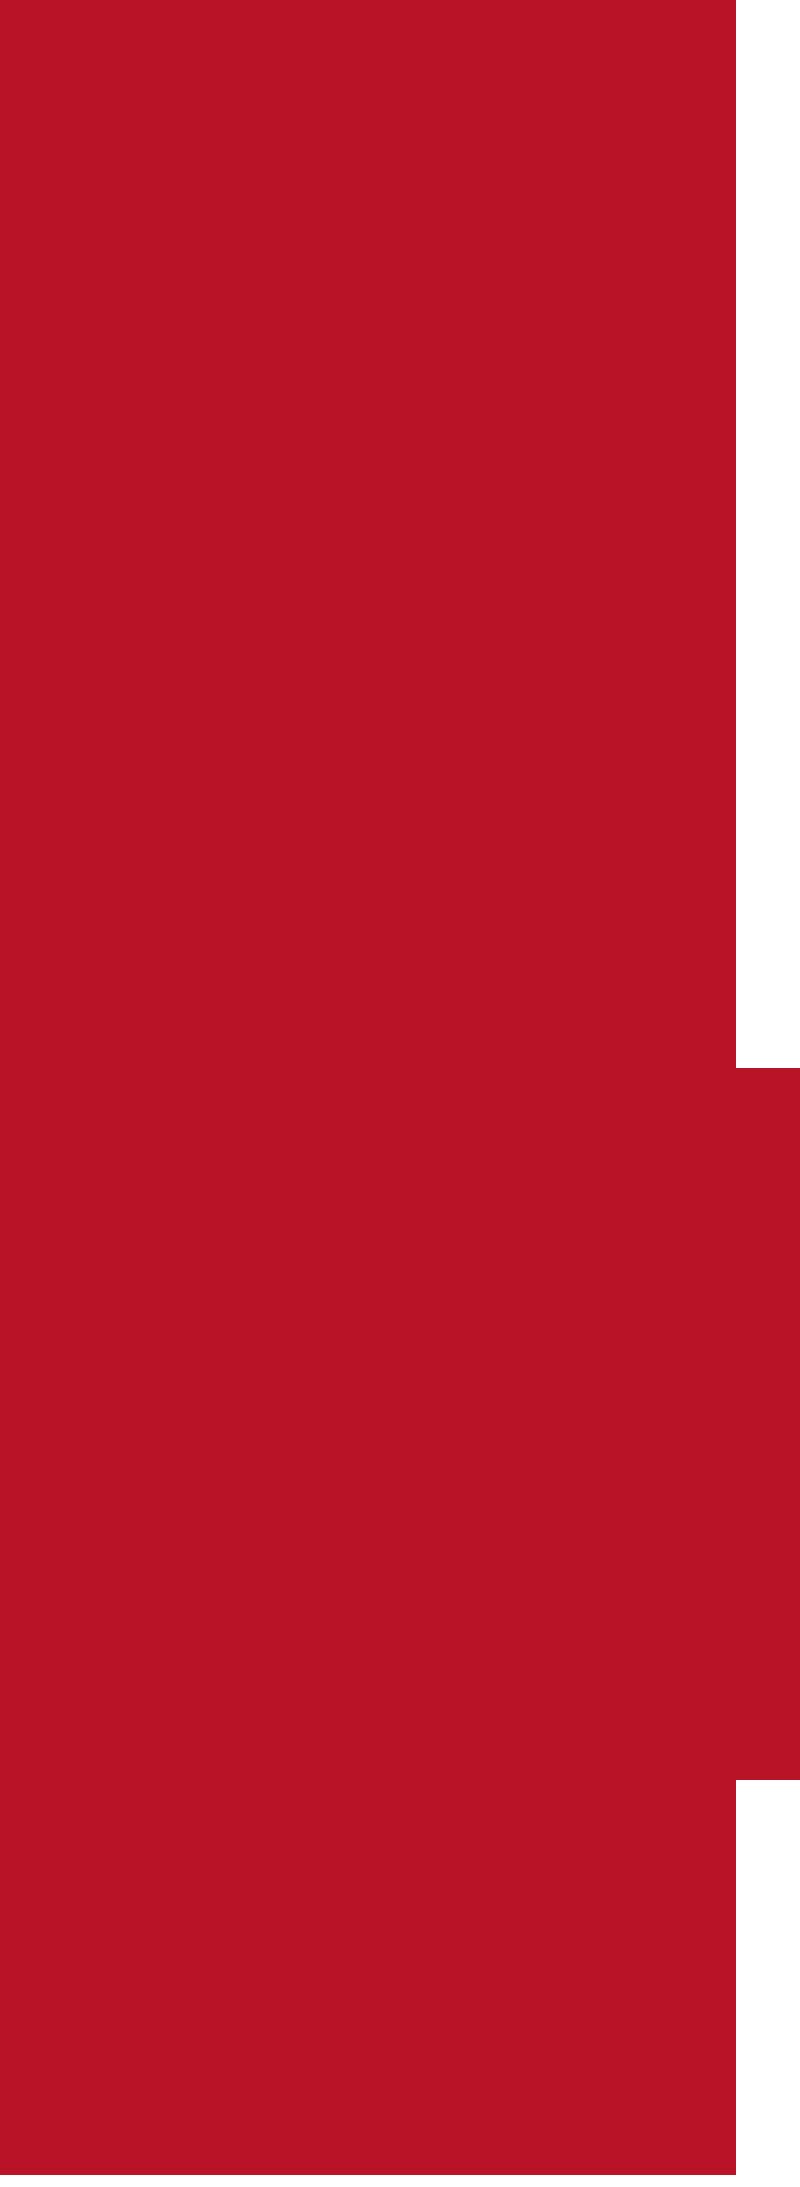 Treble clef in dark red.